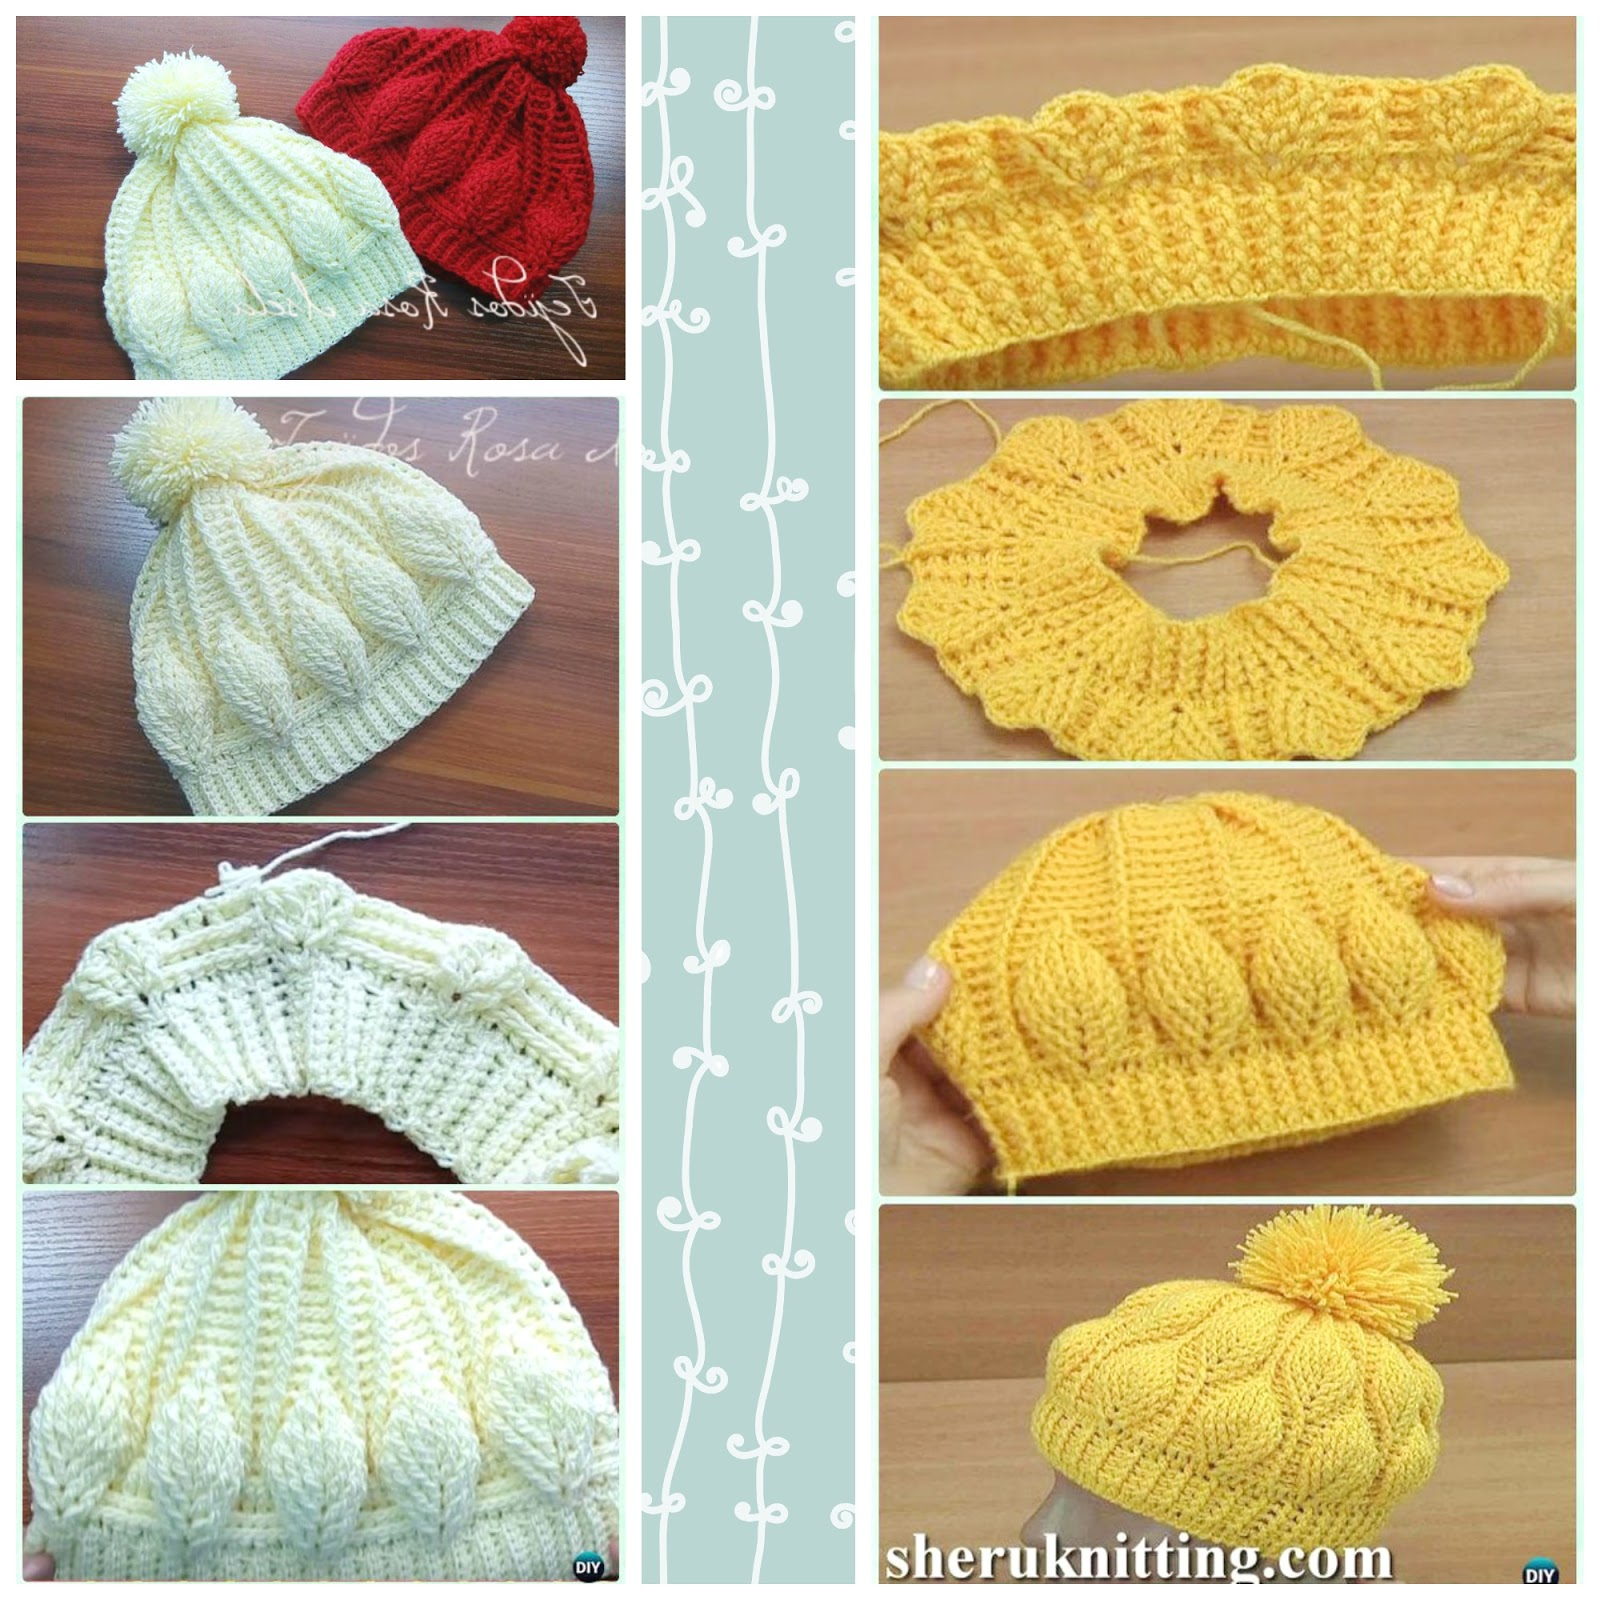 Gorro Con Hojas En Relieve Crochet Paso A Paso